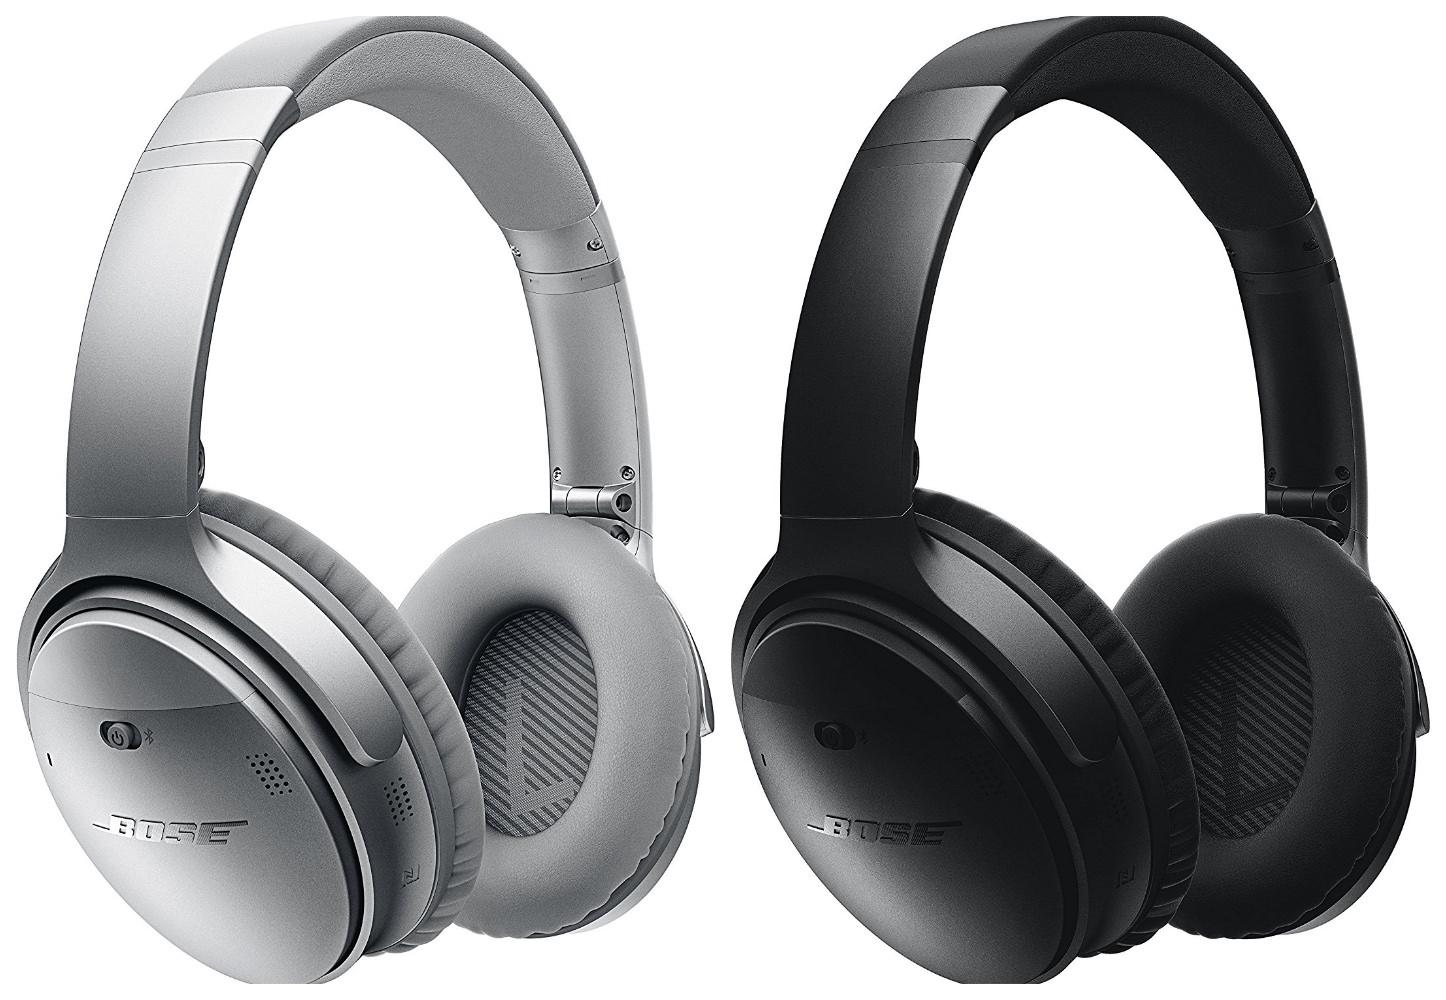 Bose-QC35-Headphones.jpg